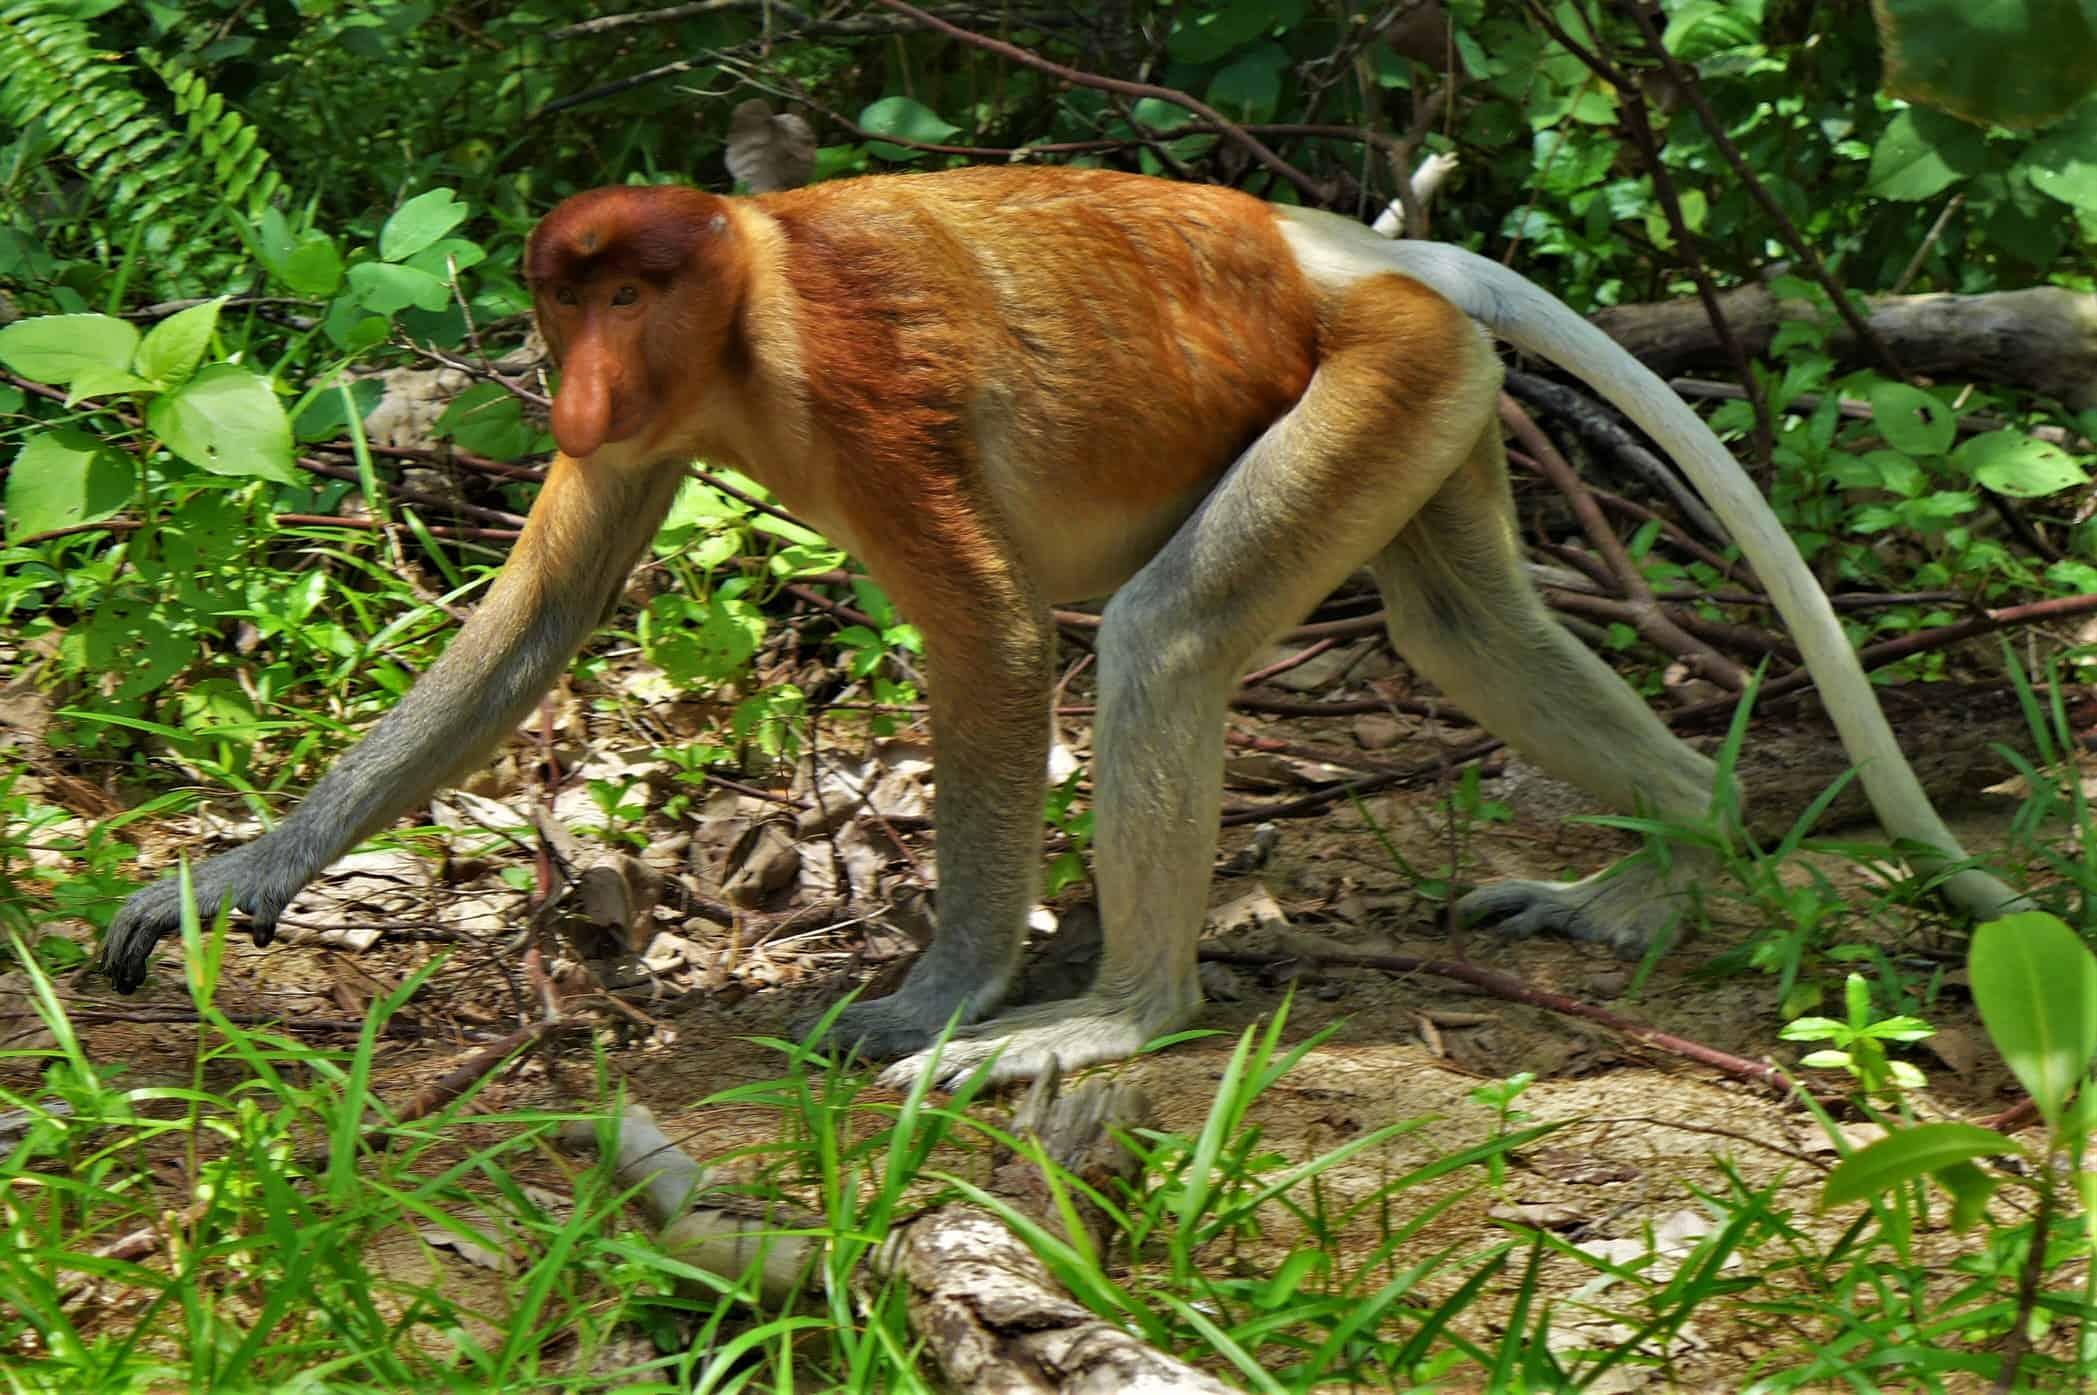 nosacz, nosacz sundajski, Bako National Park